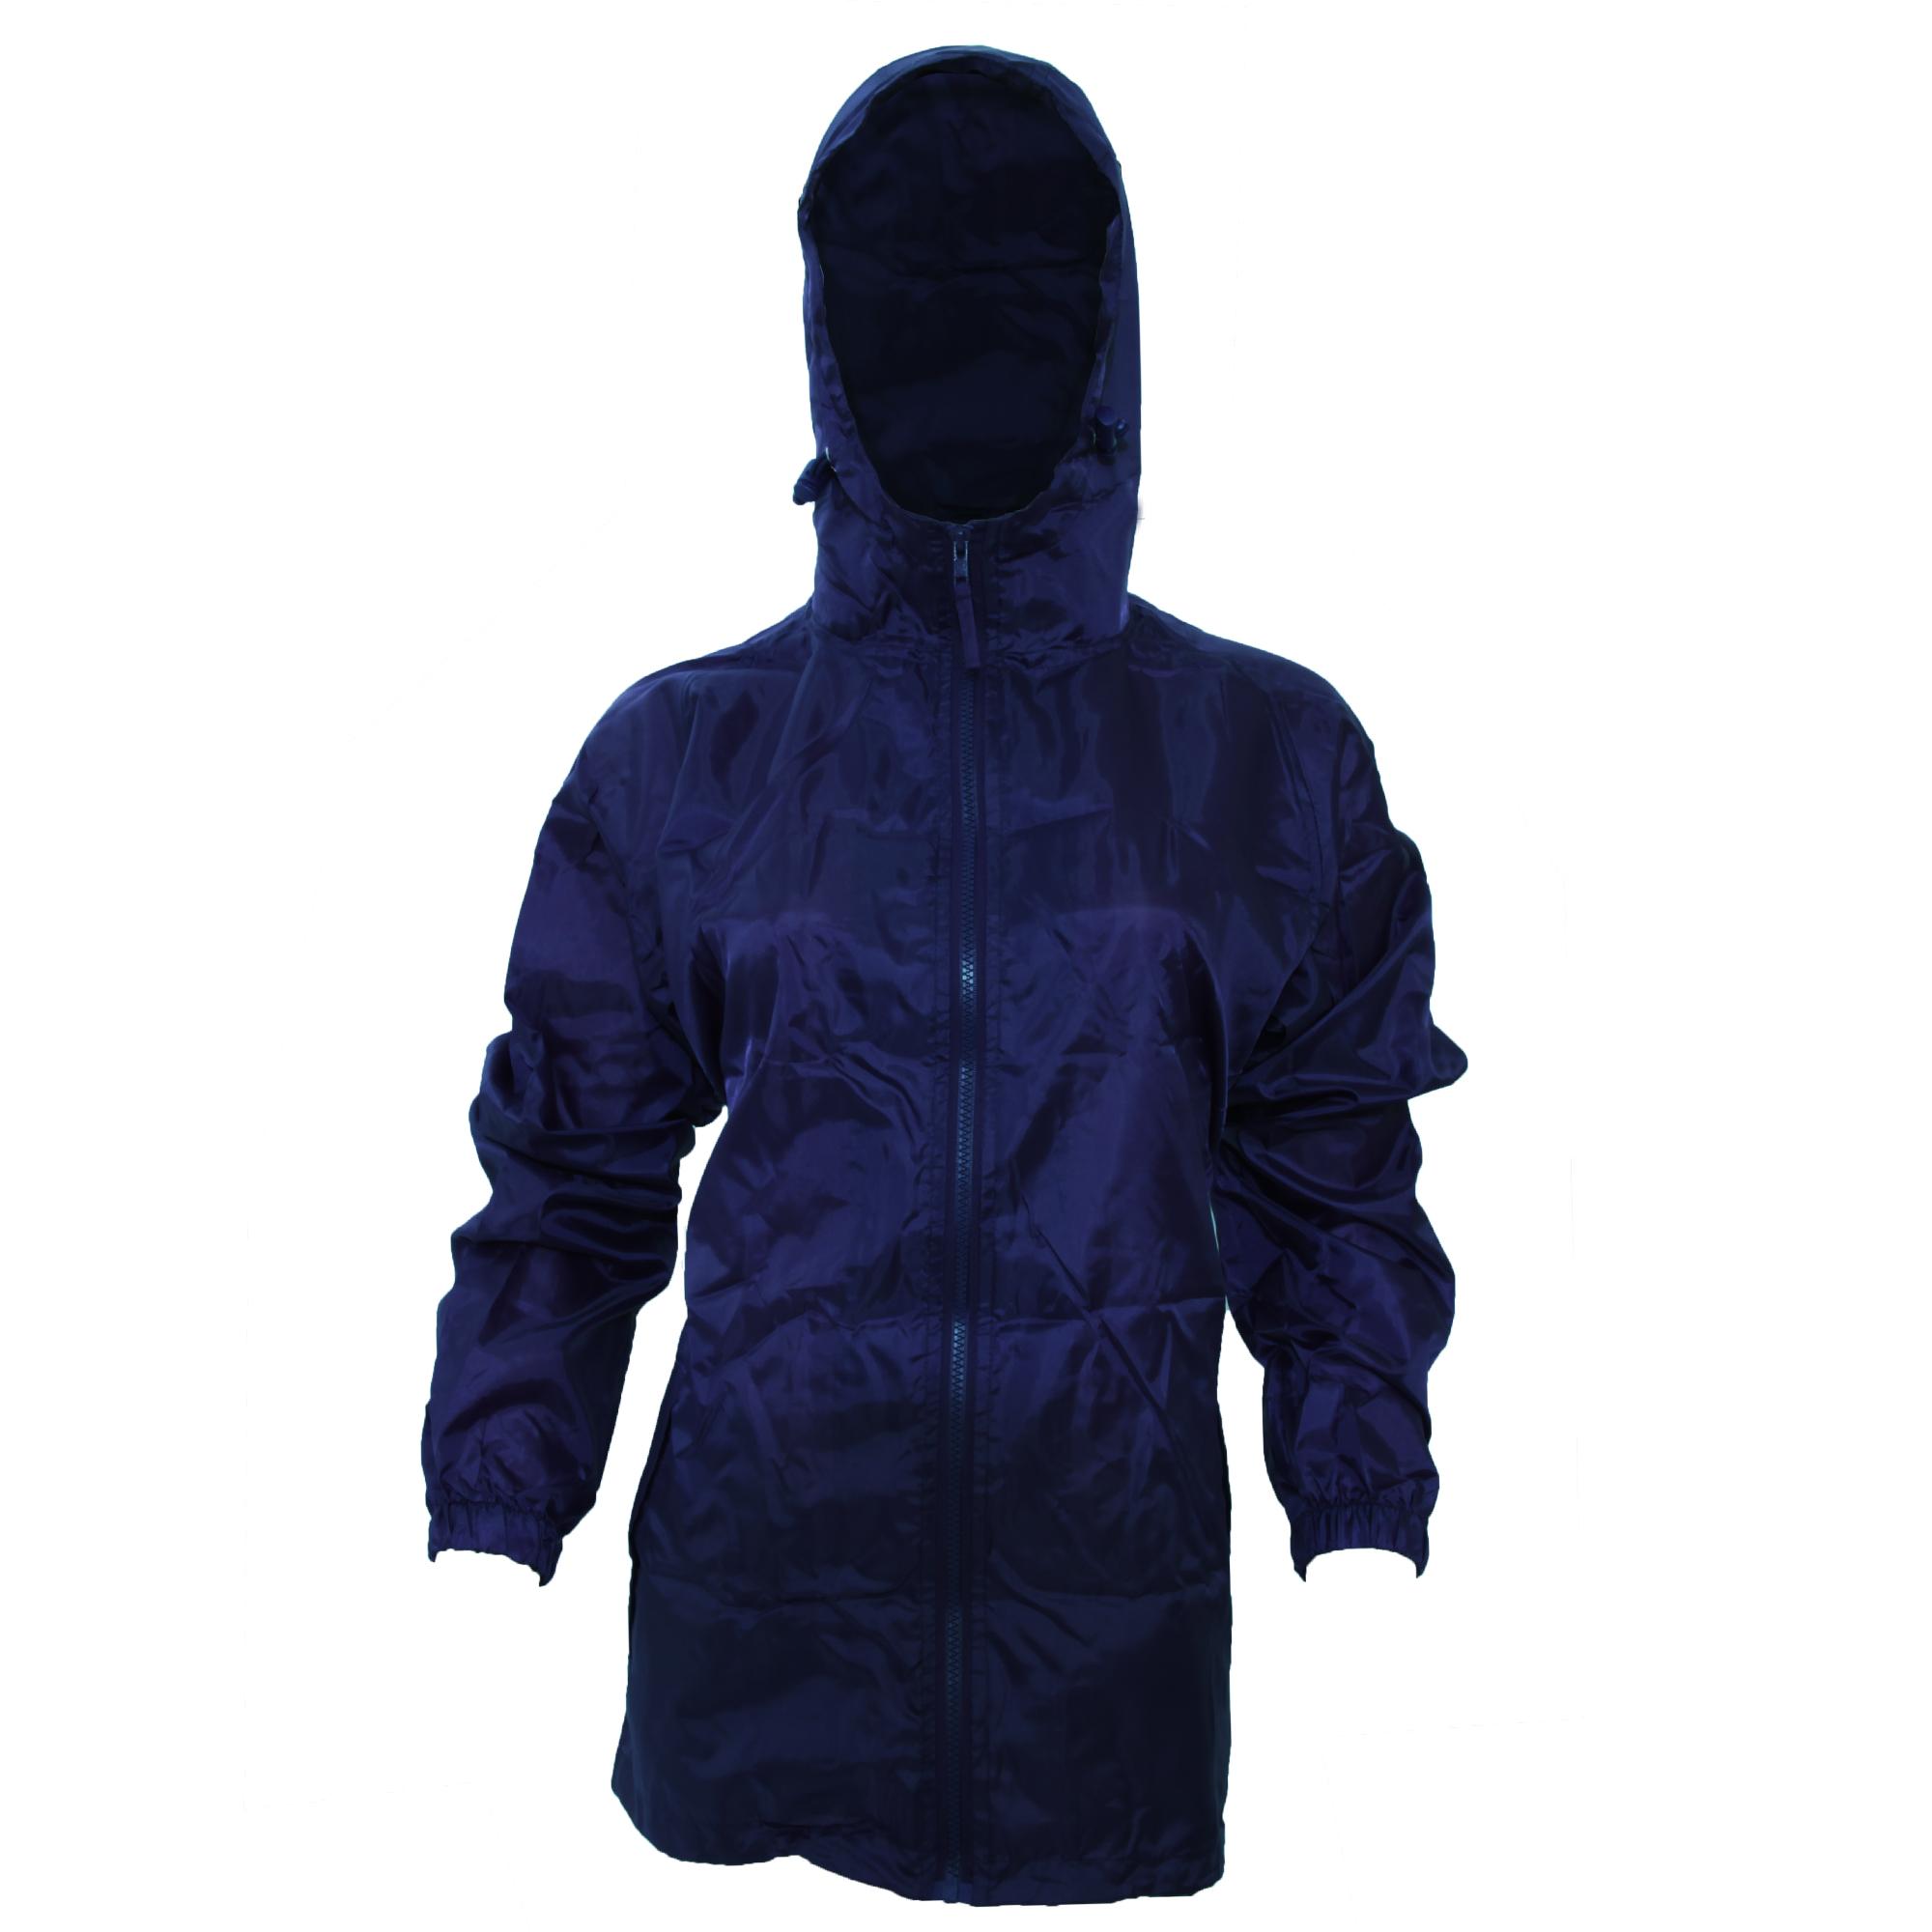 Womens hooded rain jackets